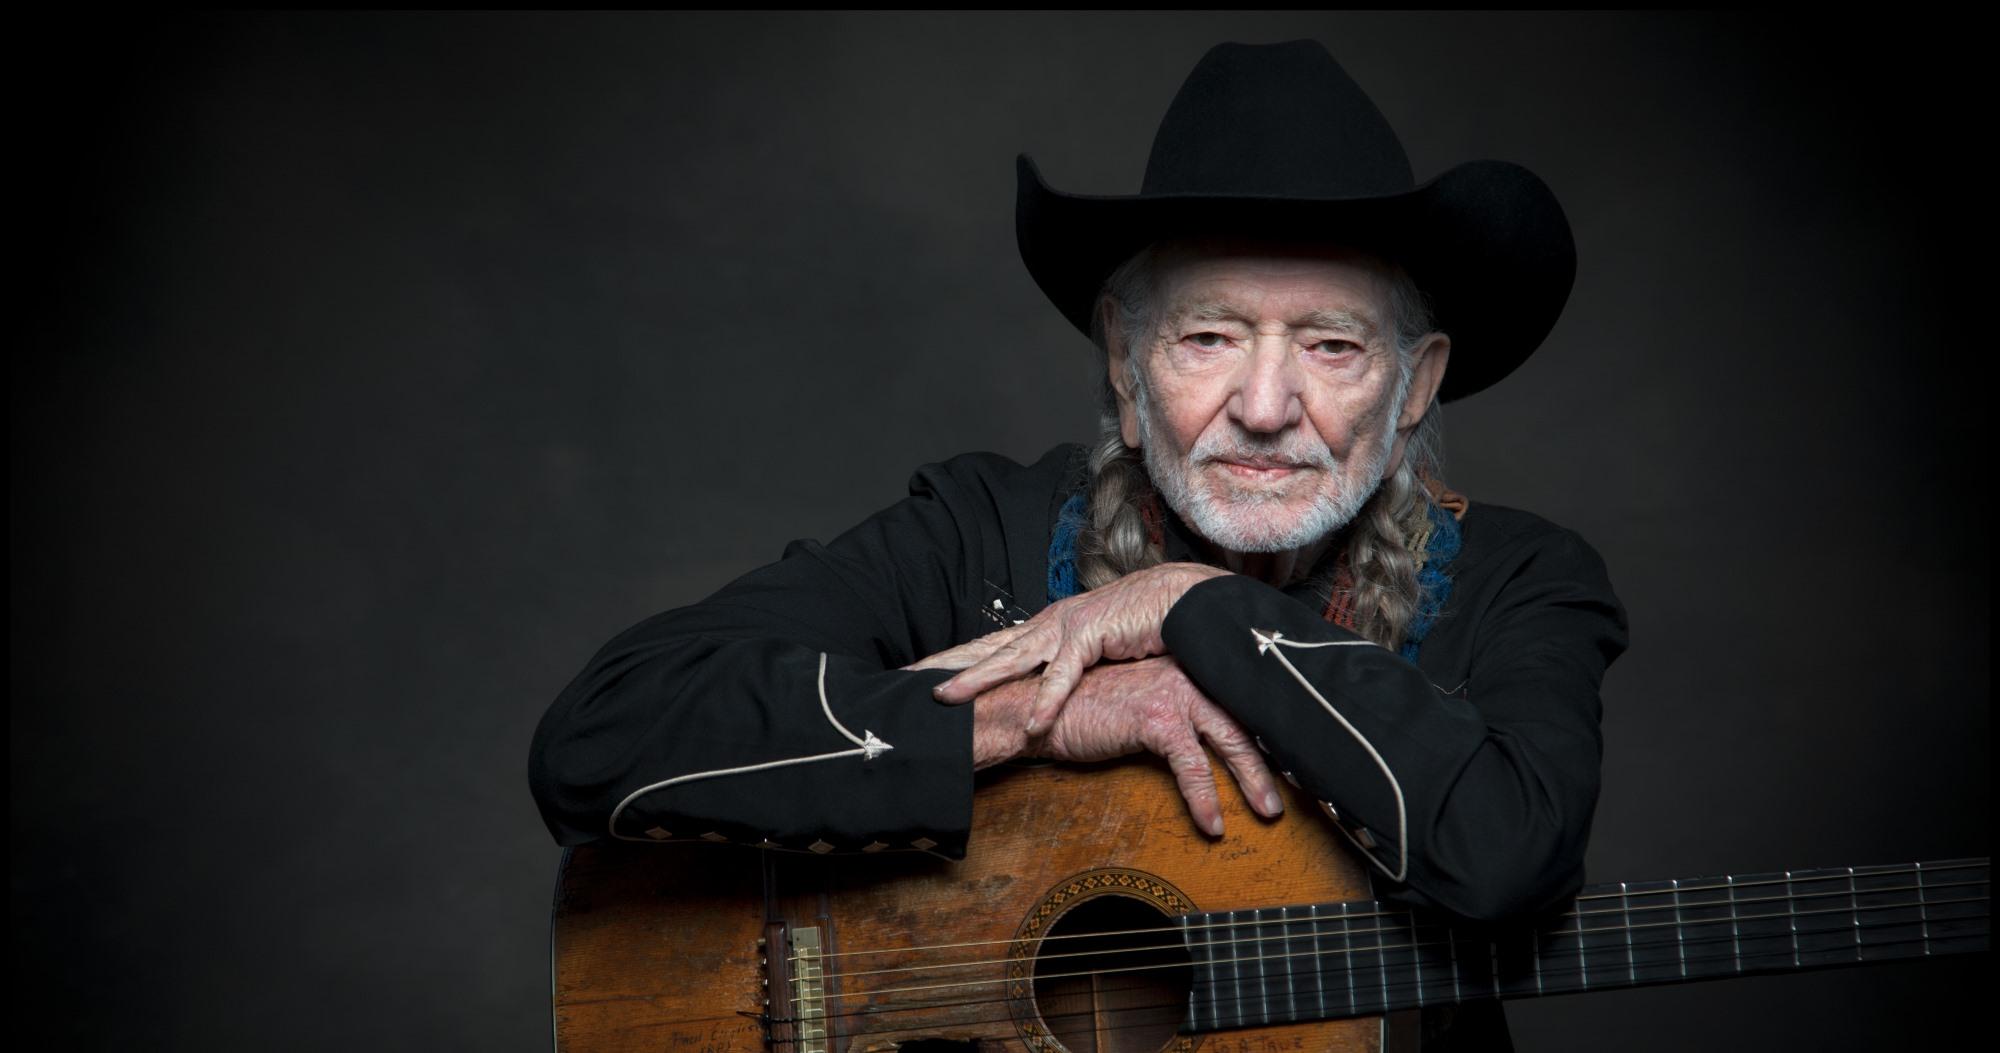 De 25 van 2019: 22. Willie Nelson – Ride Me Back Home